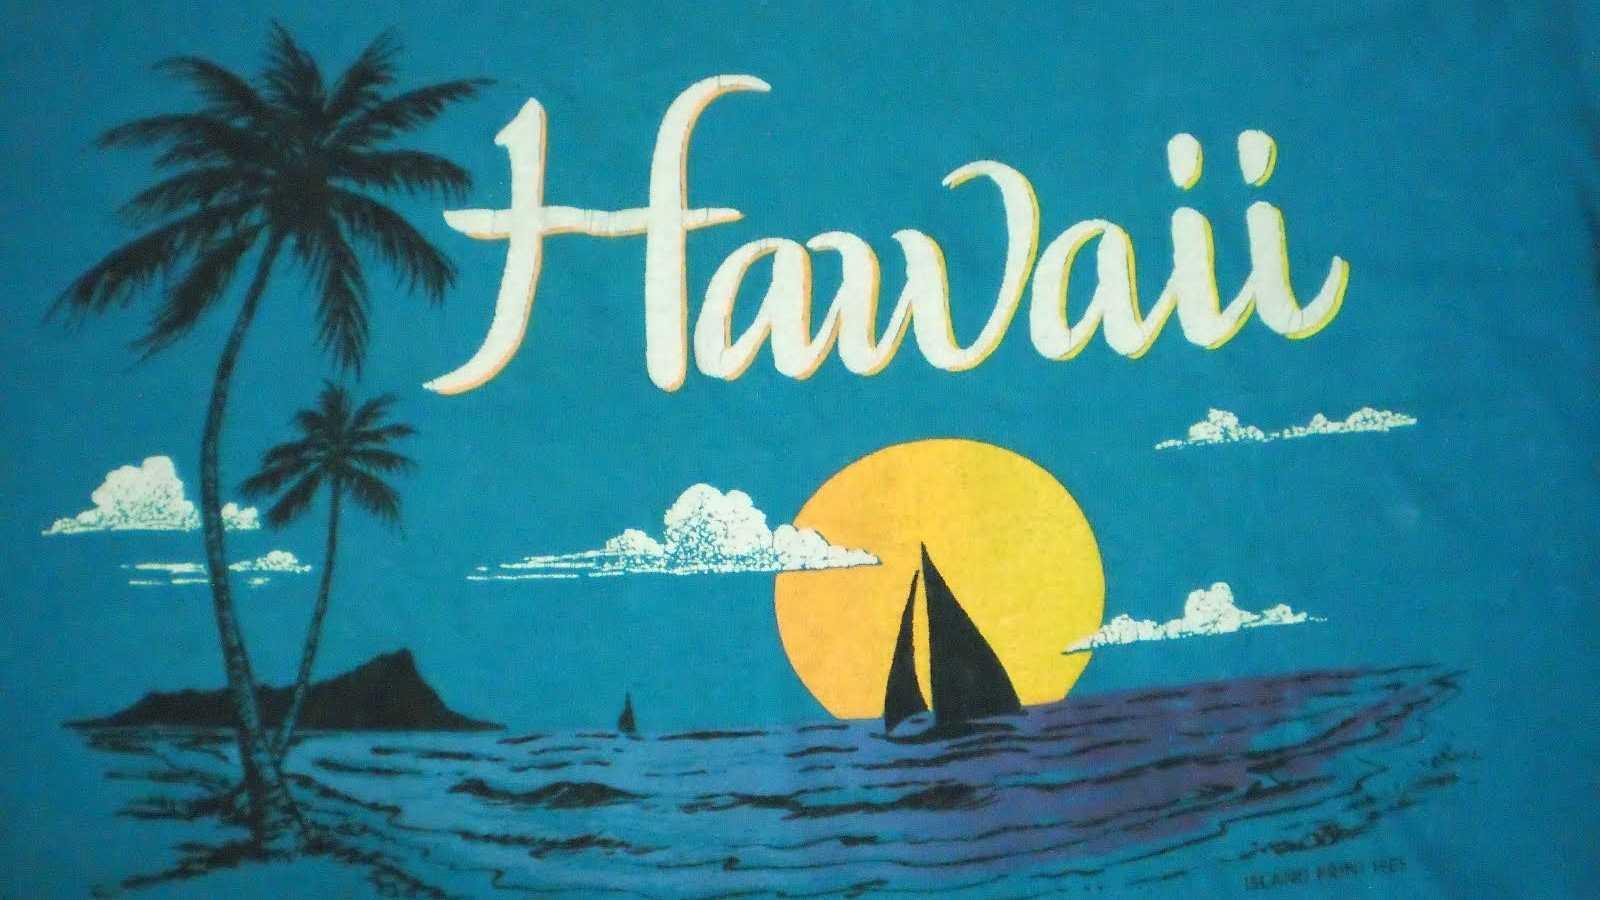 Amordiscos - ¡Vámonos a Hawai! - 31/03/21